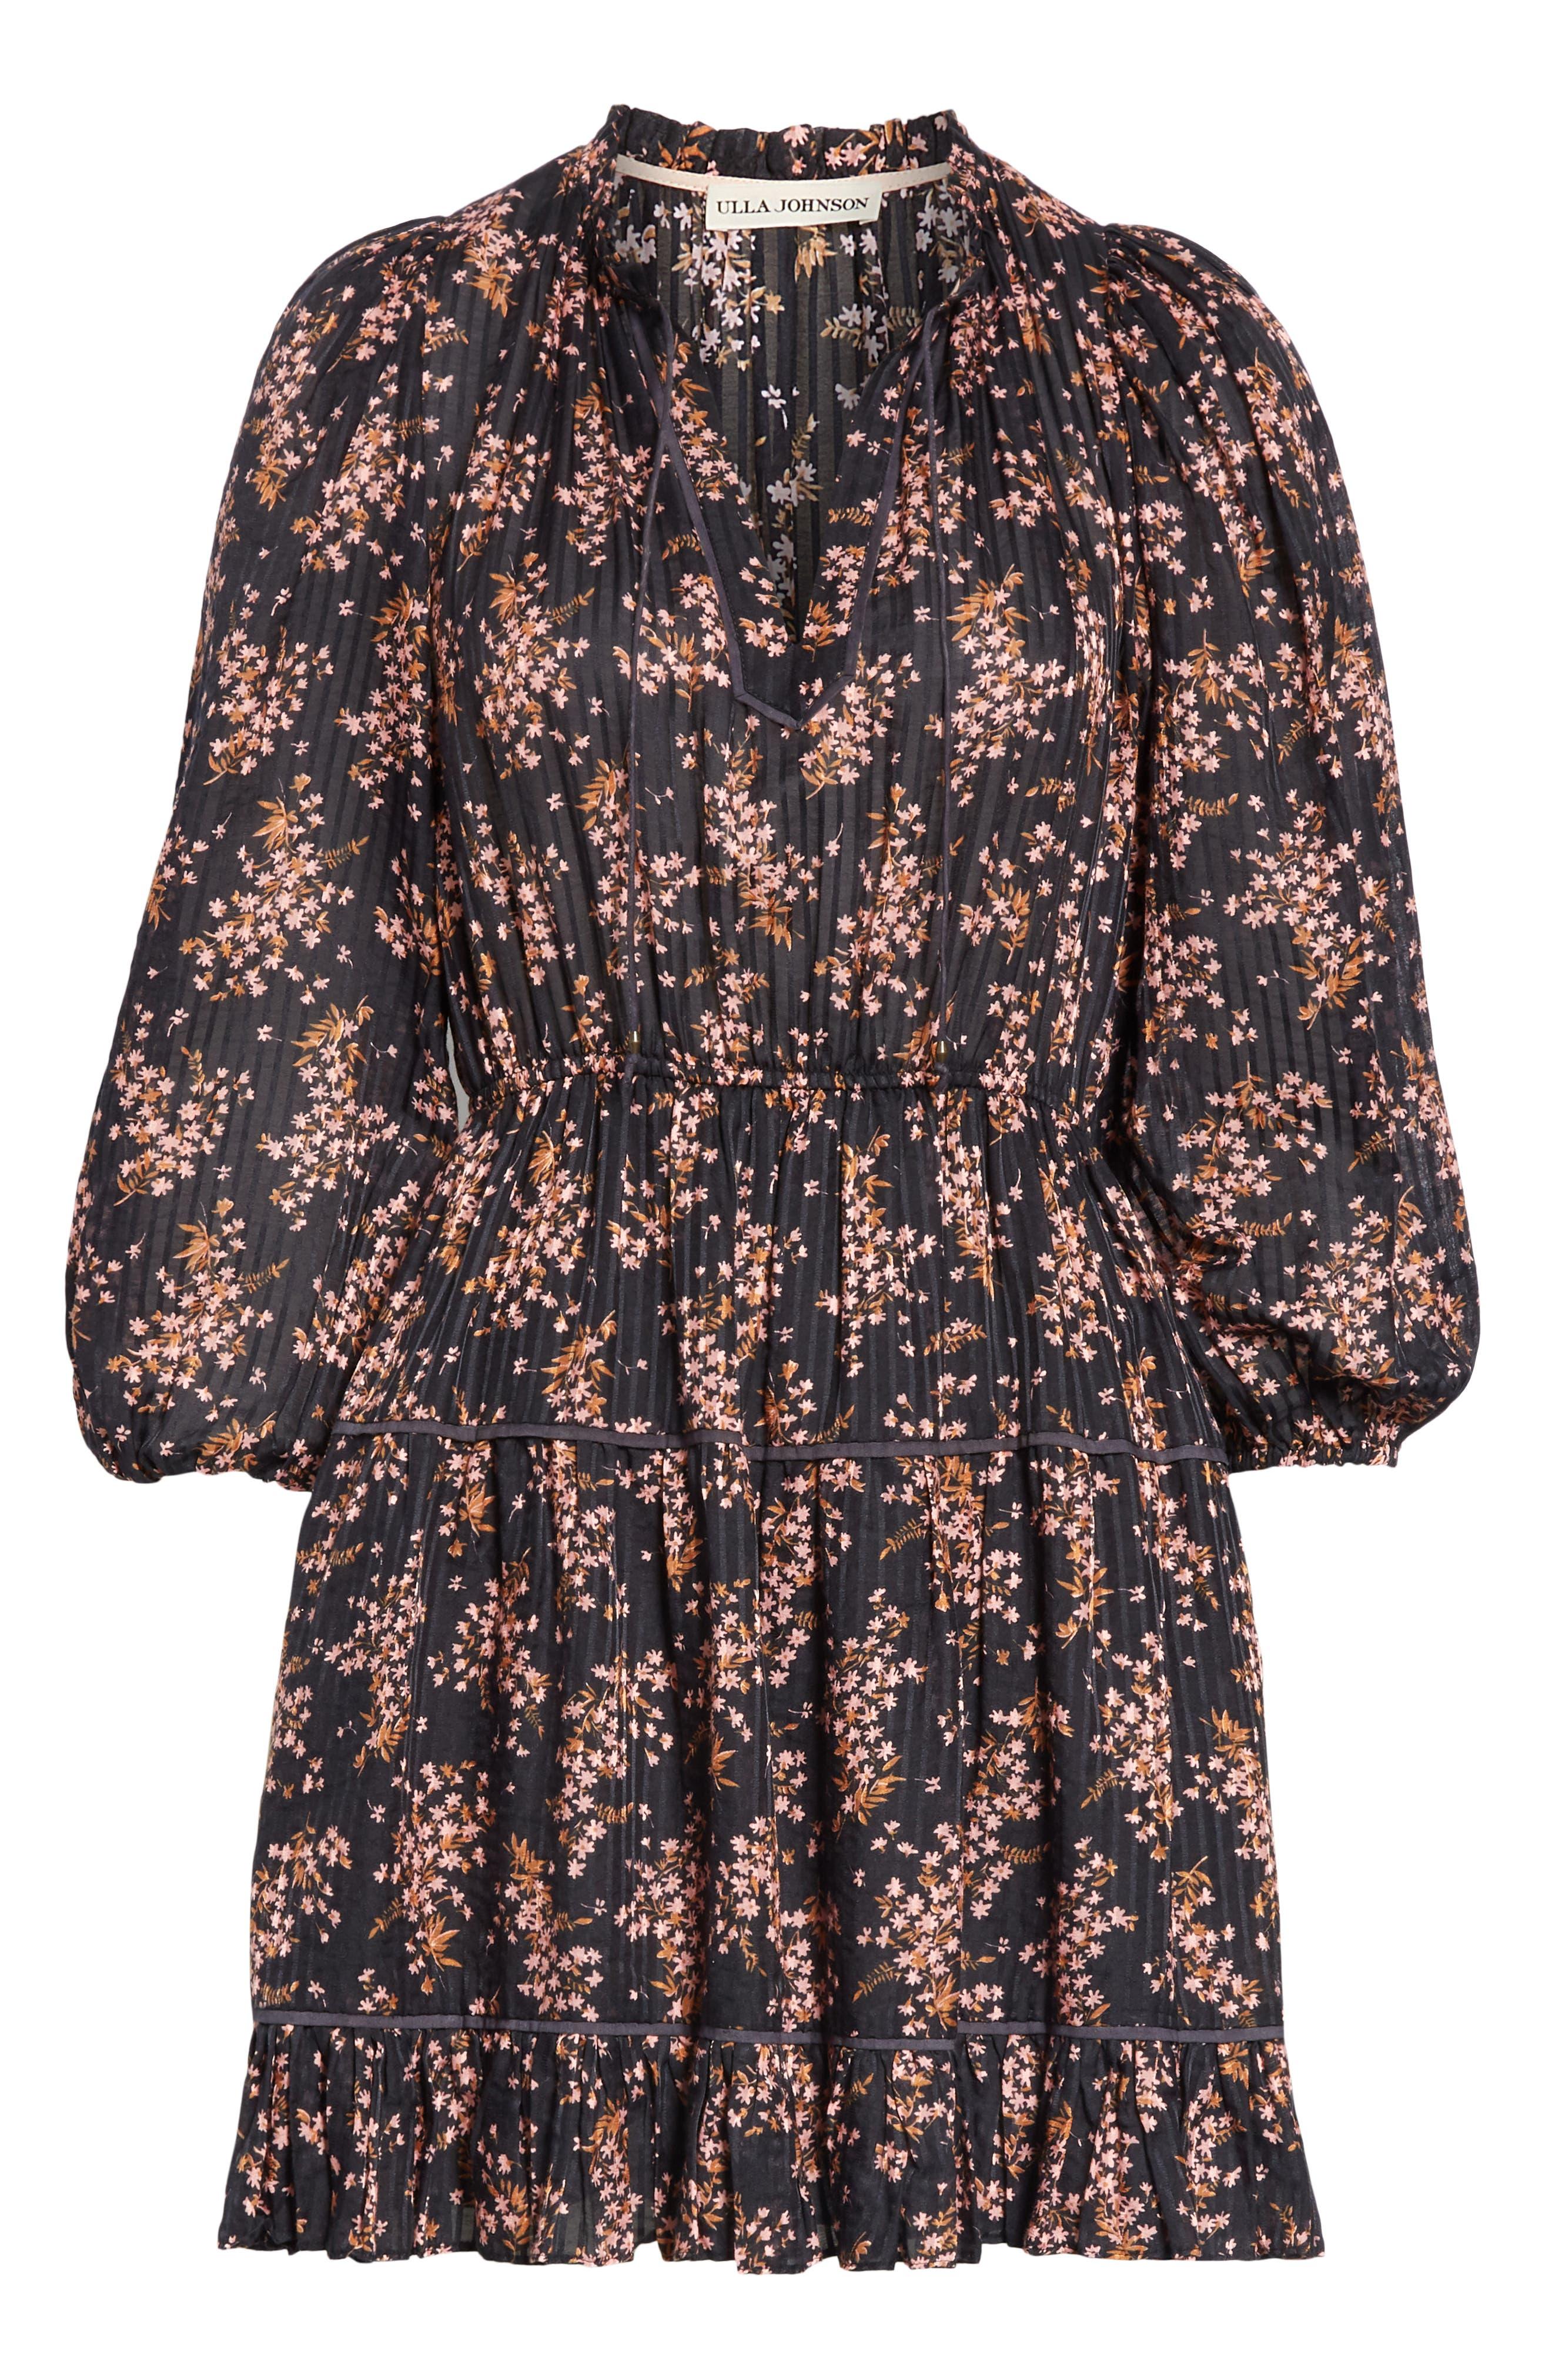 ULLA JOHNSON,                             Brienne Floral Print Cotton & Silk Minidress,                             Alternate thumbnail 7, color,                             JET